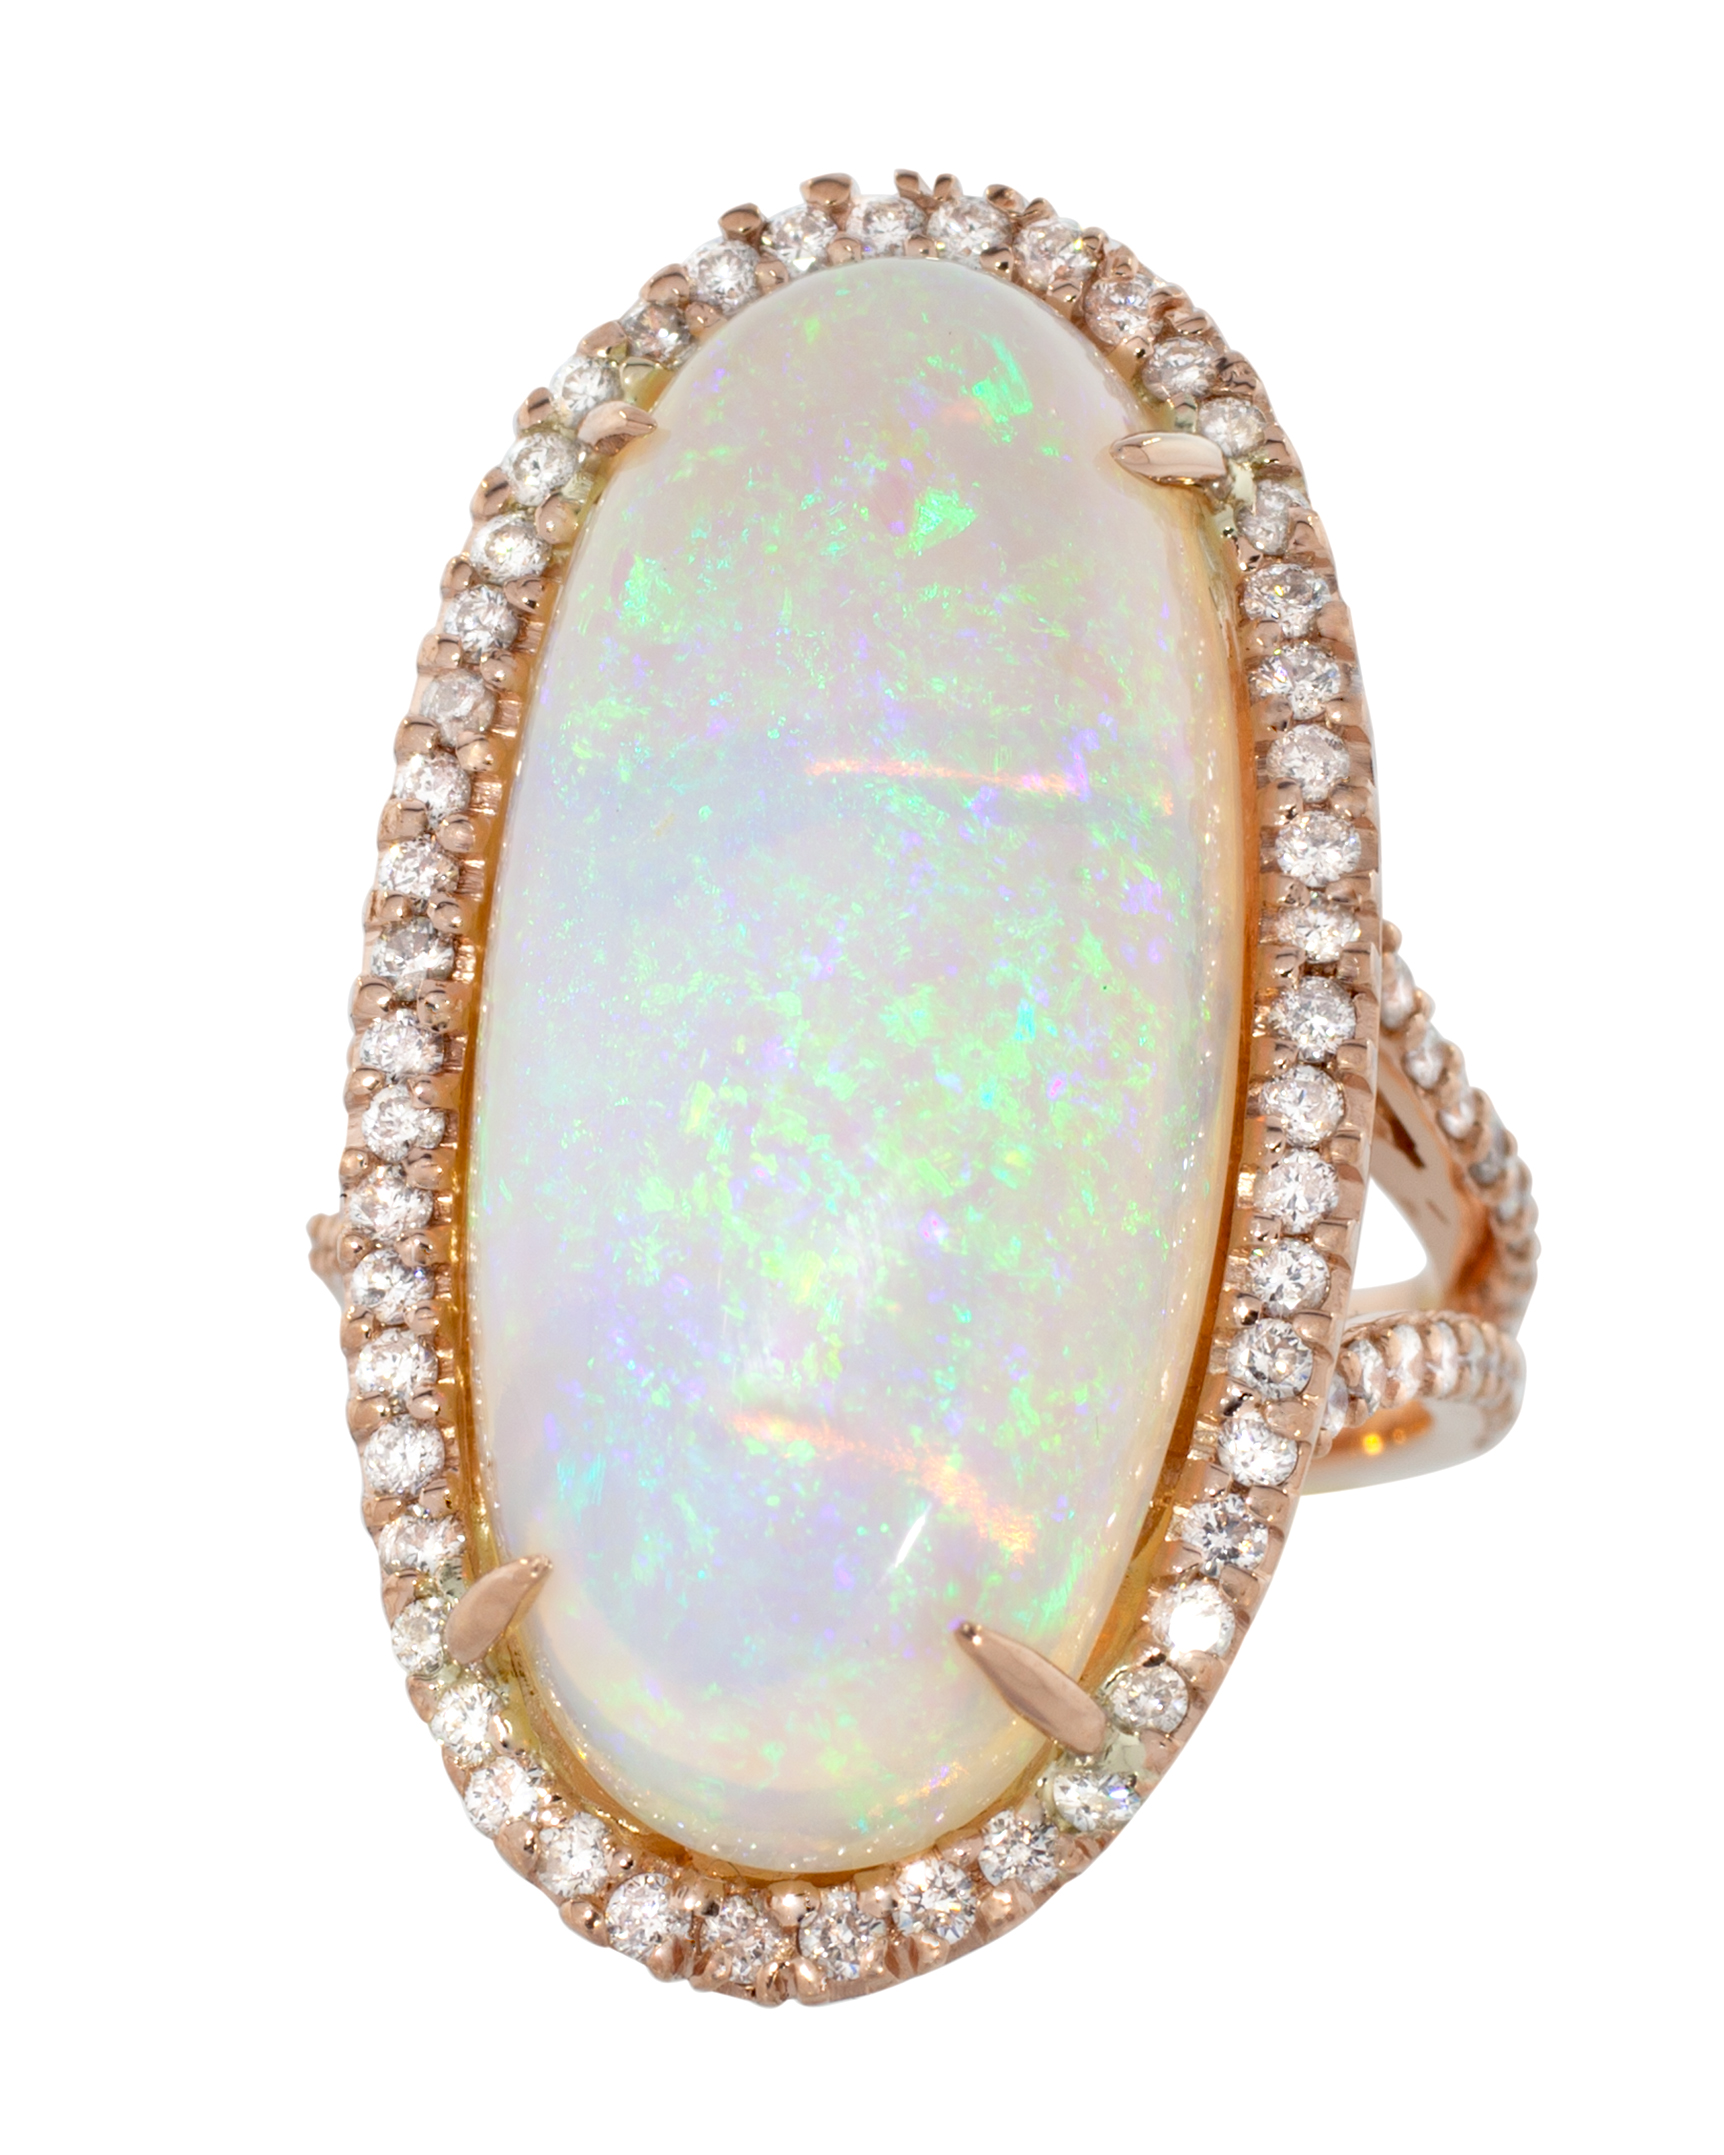 opal-ring-kimberley-mcdonald-0115.jpg